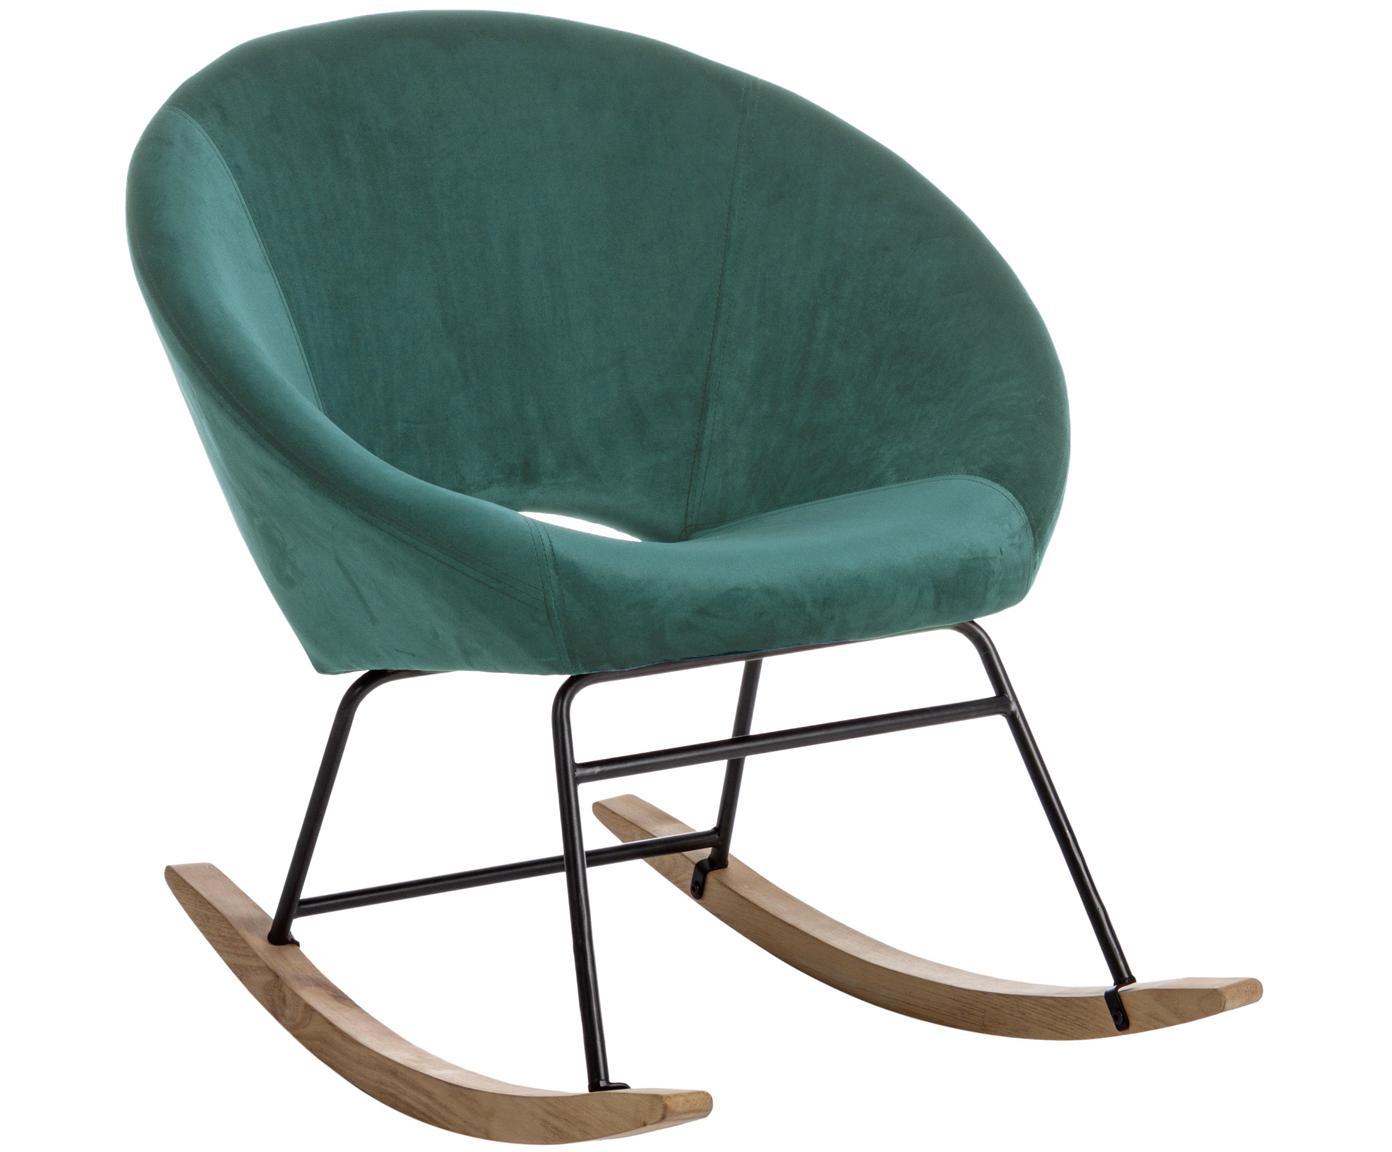 Fluwelen schommelstoel Annika, Bekleding: polyester fluweel, Frame: gepoedercoat metaal, Frame: multiplex, metaal, Pauwblauw, B 74 x D 77 cm